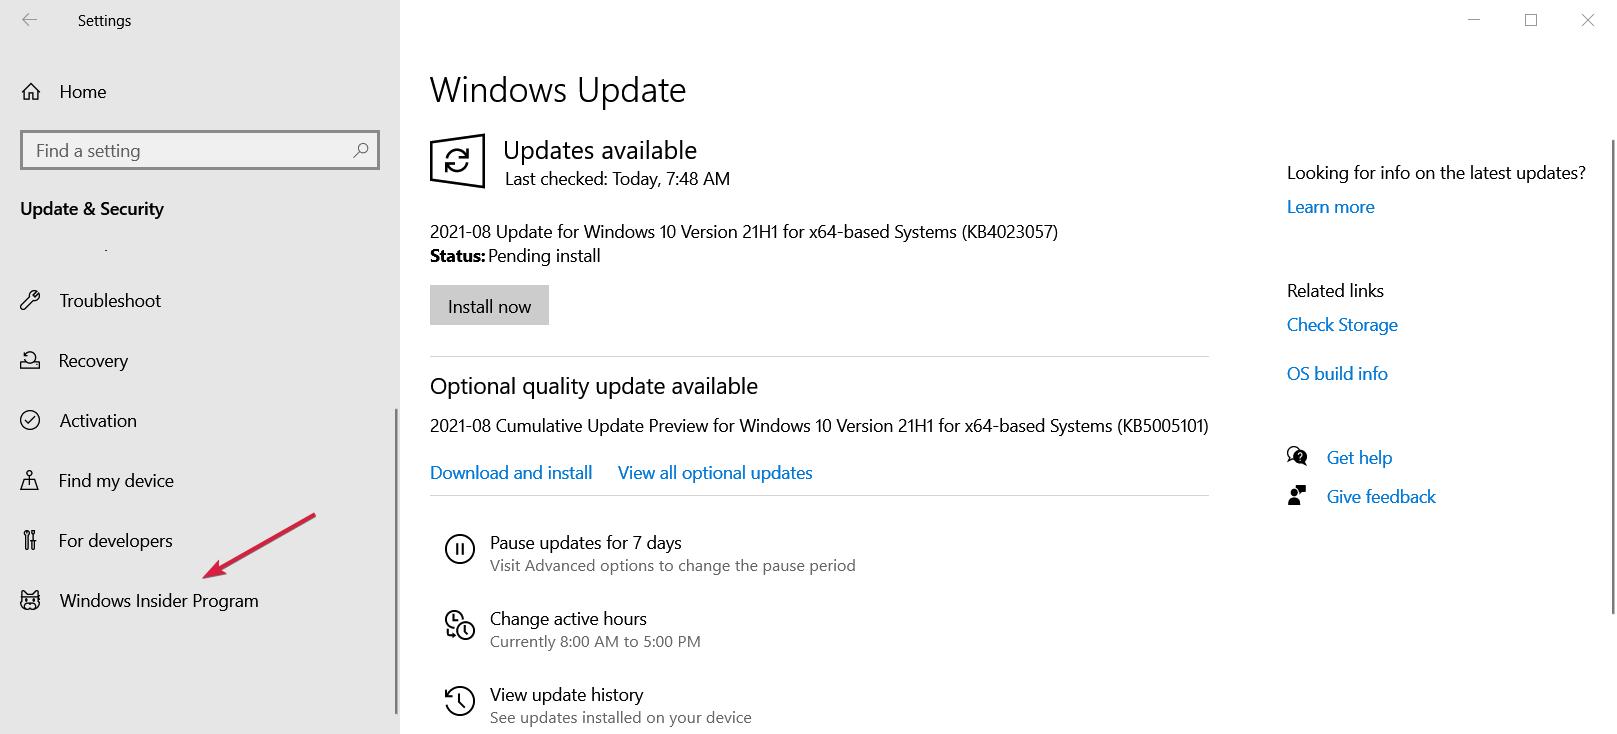 Windows-insider-program-1